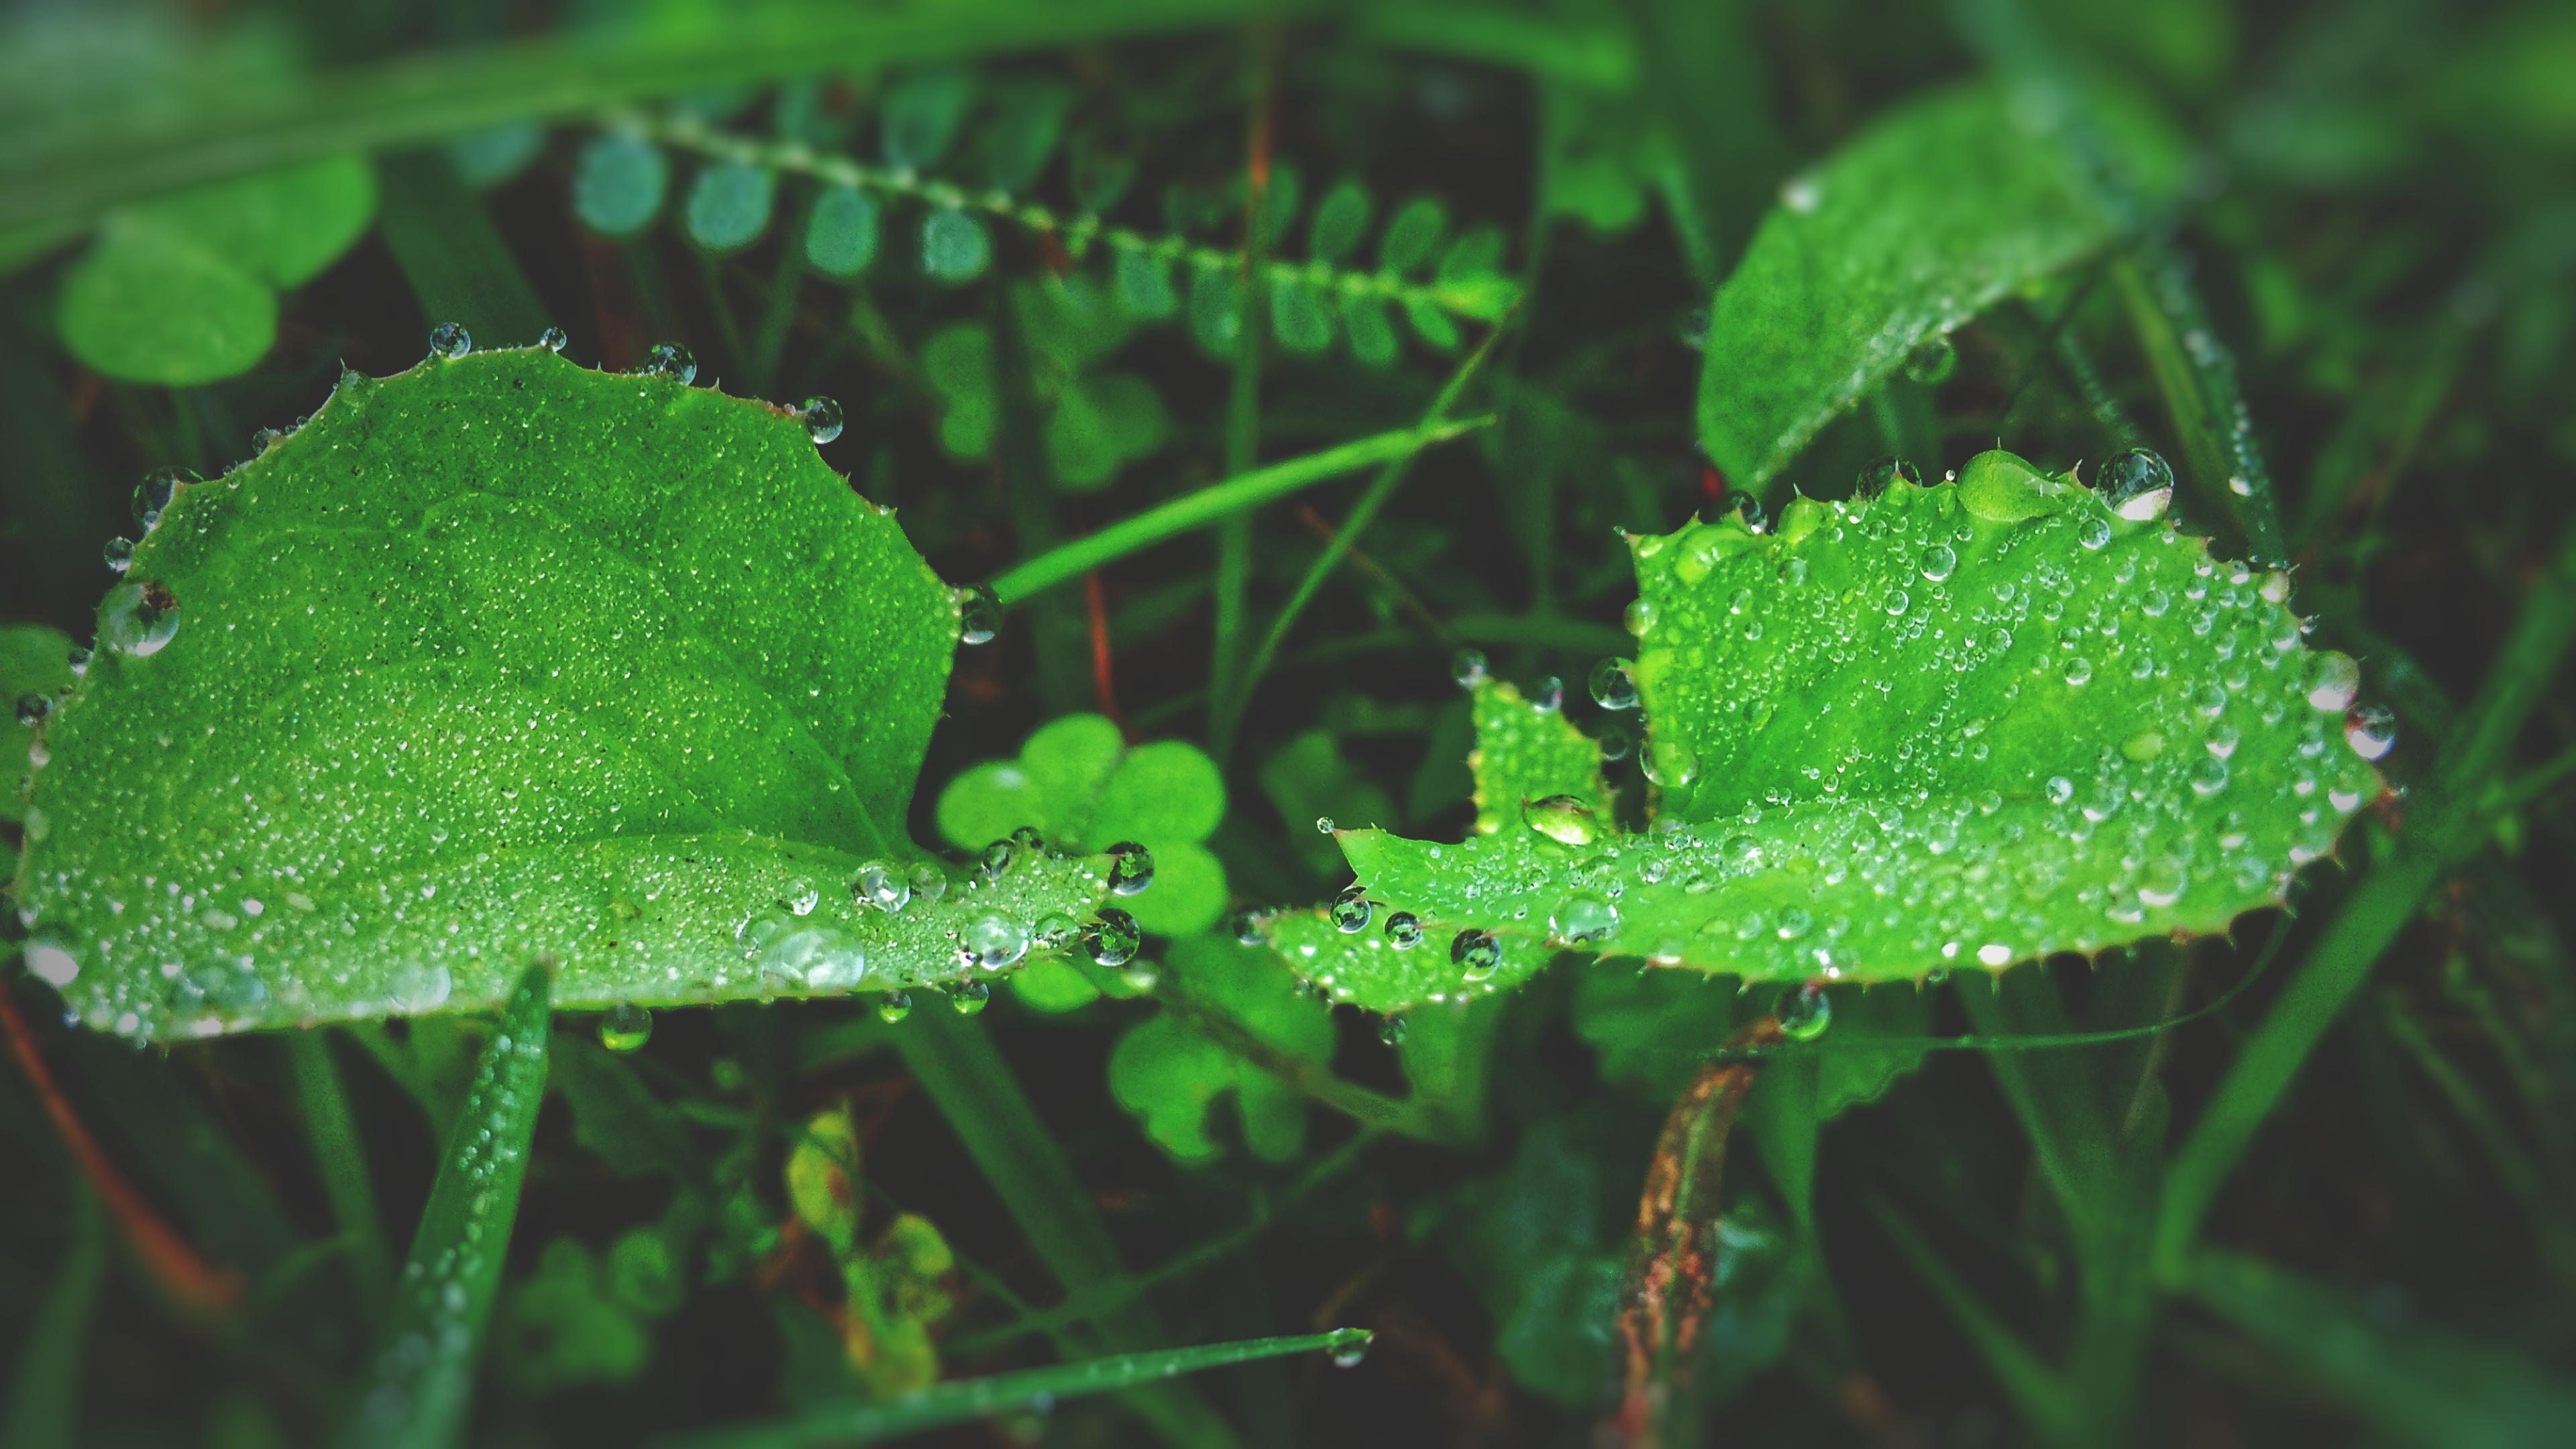 Windows 7 Wallpaper Hd Macro Photography Of Green Leaf Plant 183 Free Stock Photo